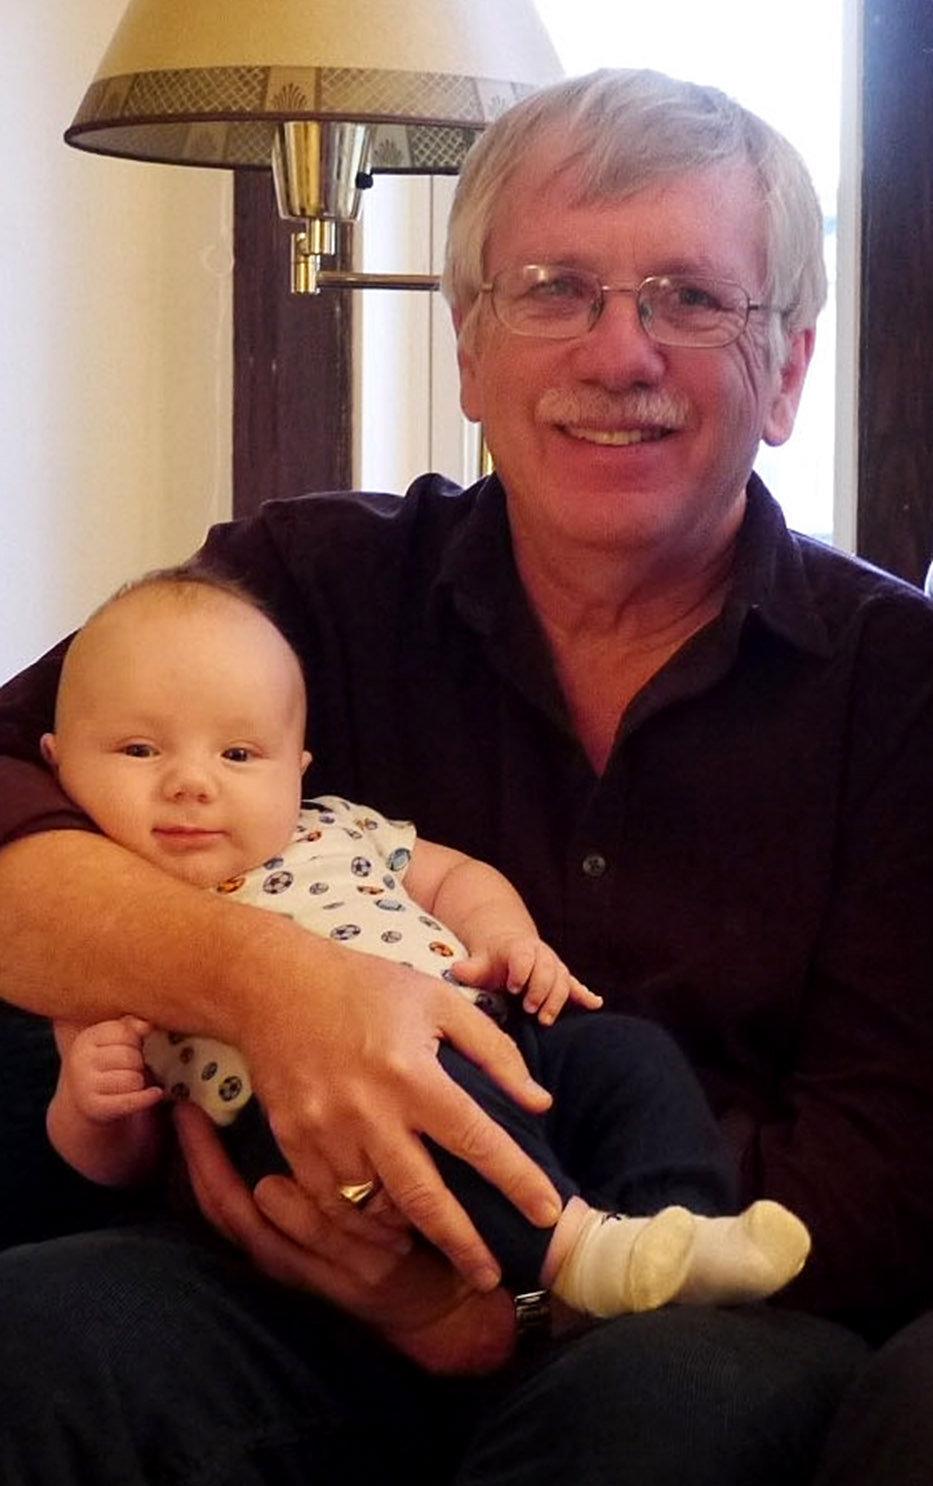 Harold et son petit fils, Henry